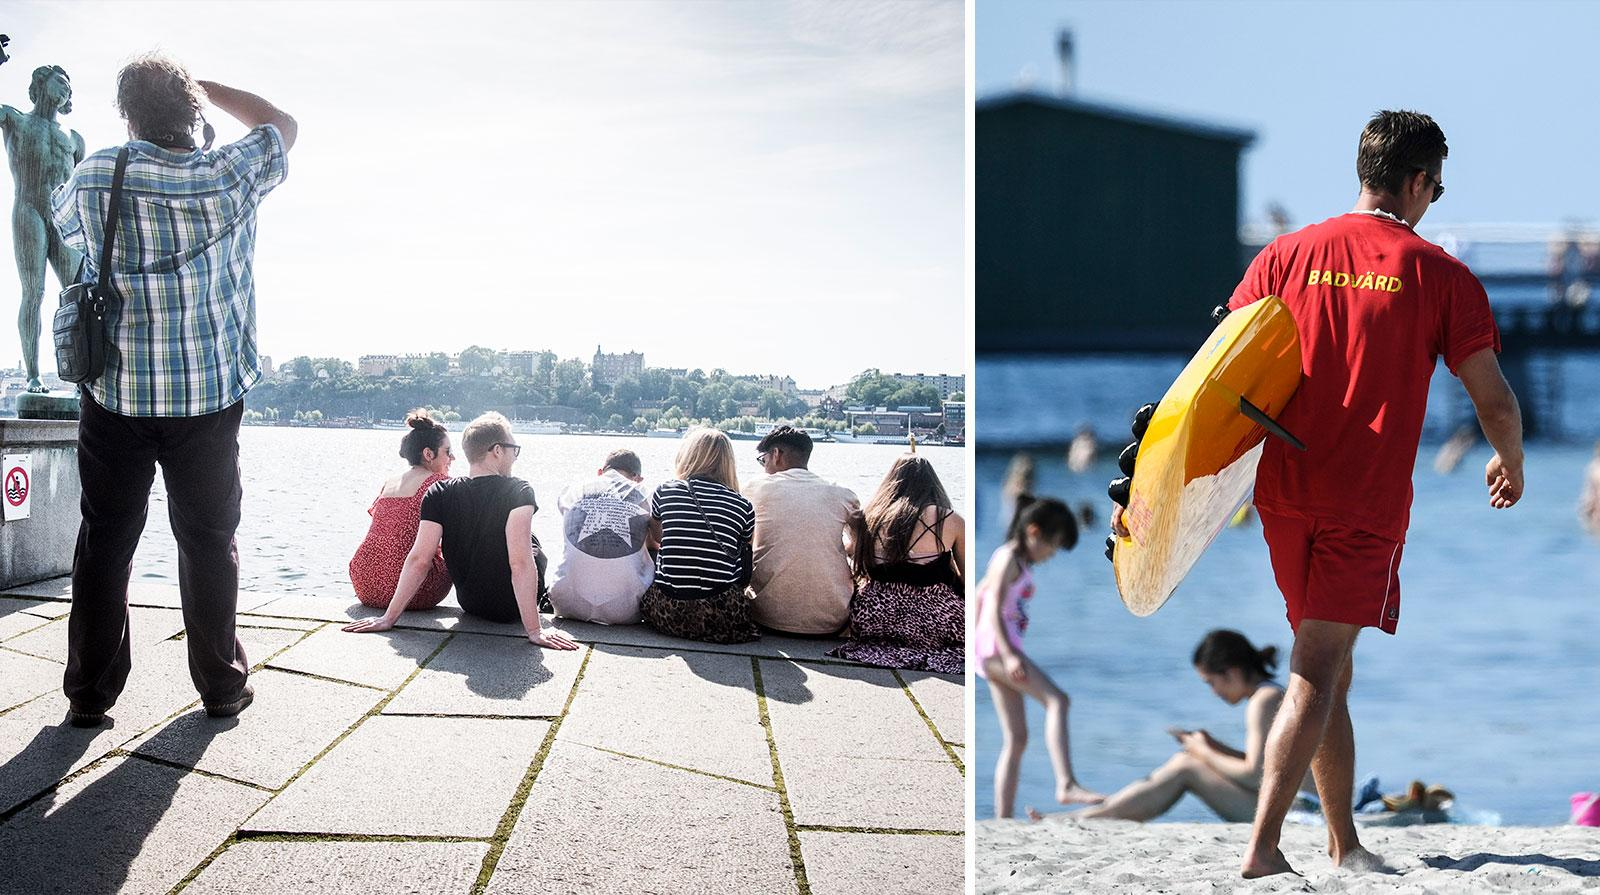 Turismen i Sverige ökar.